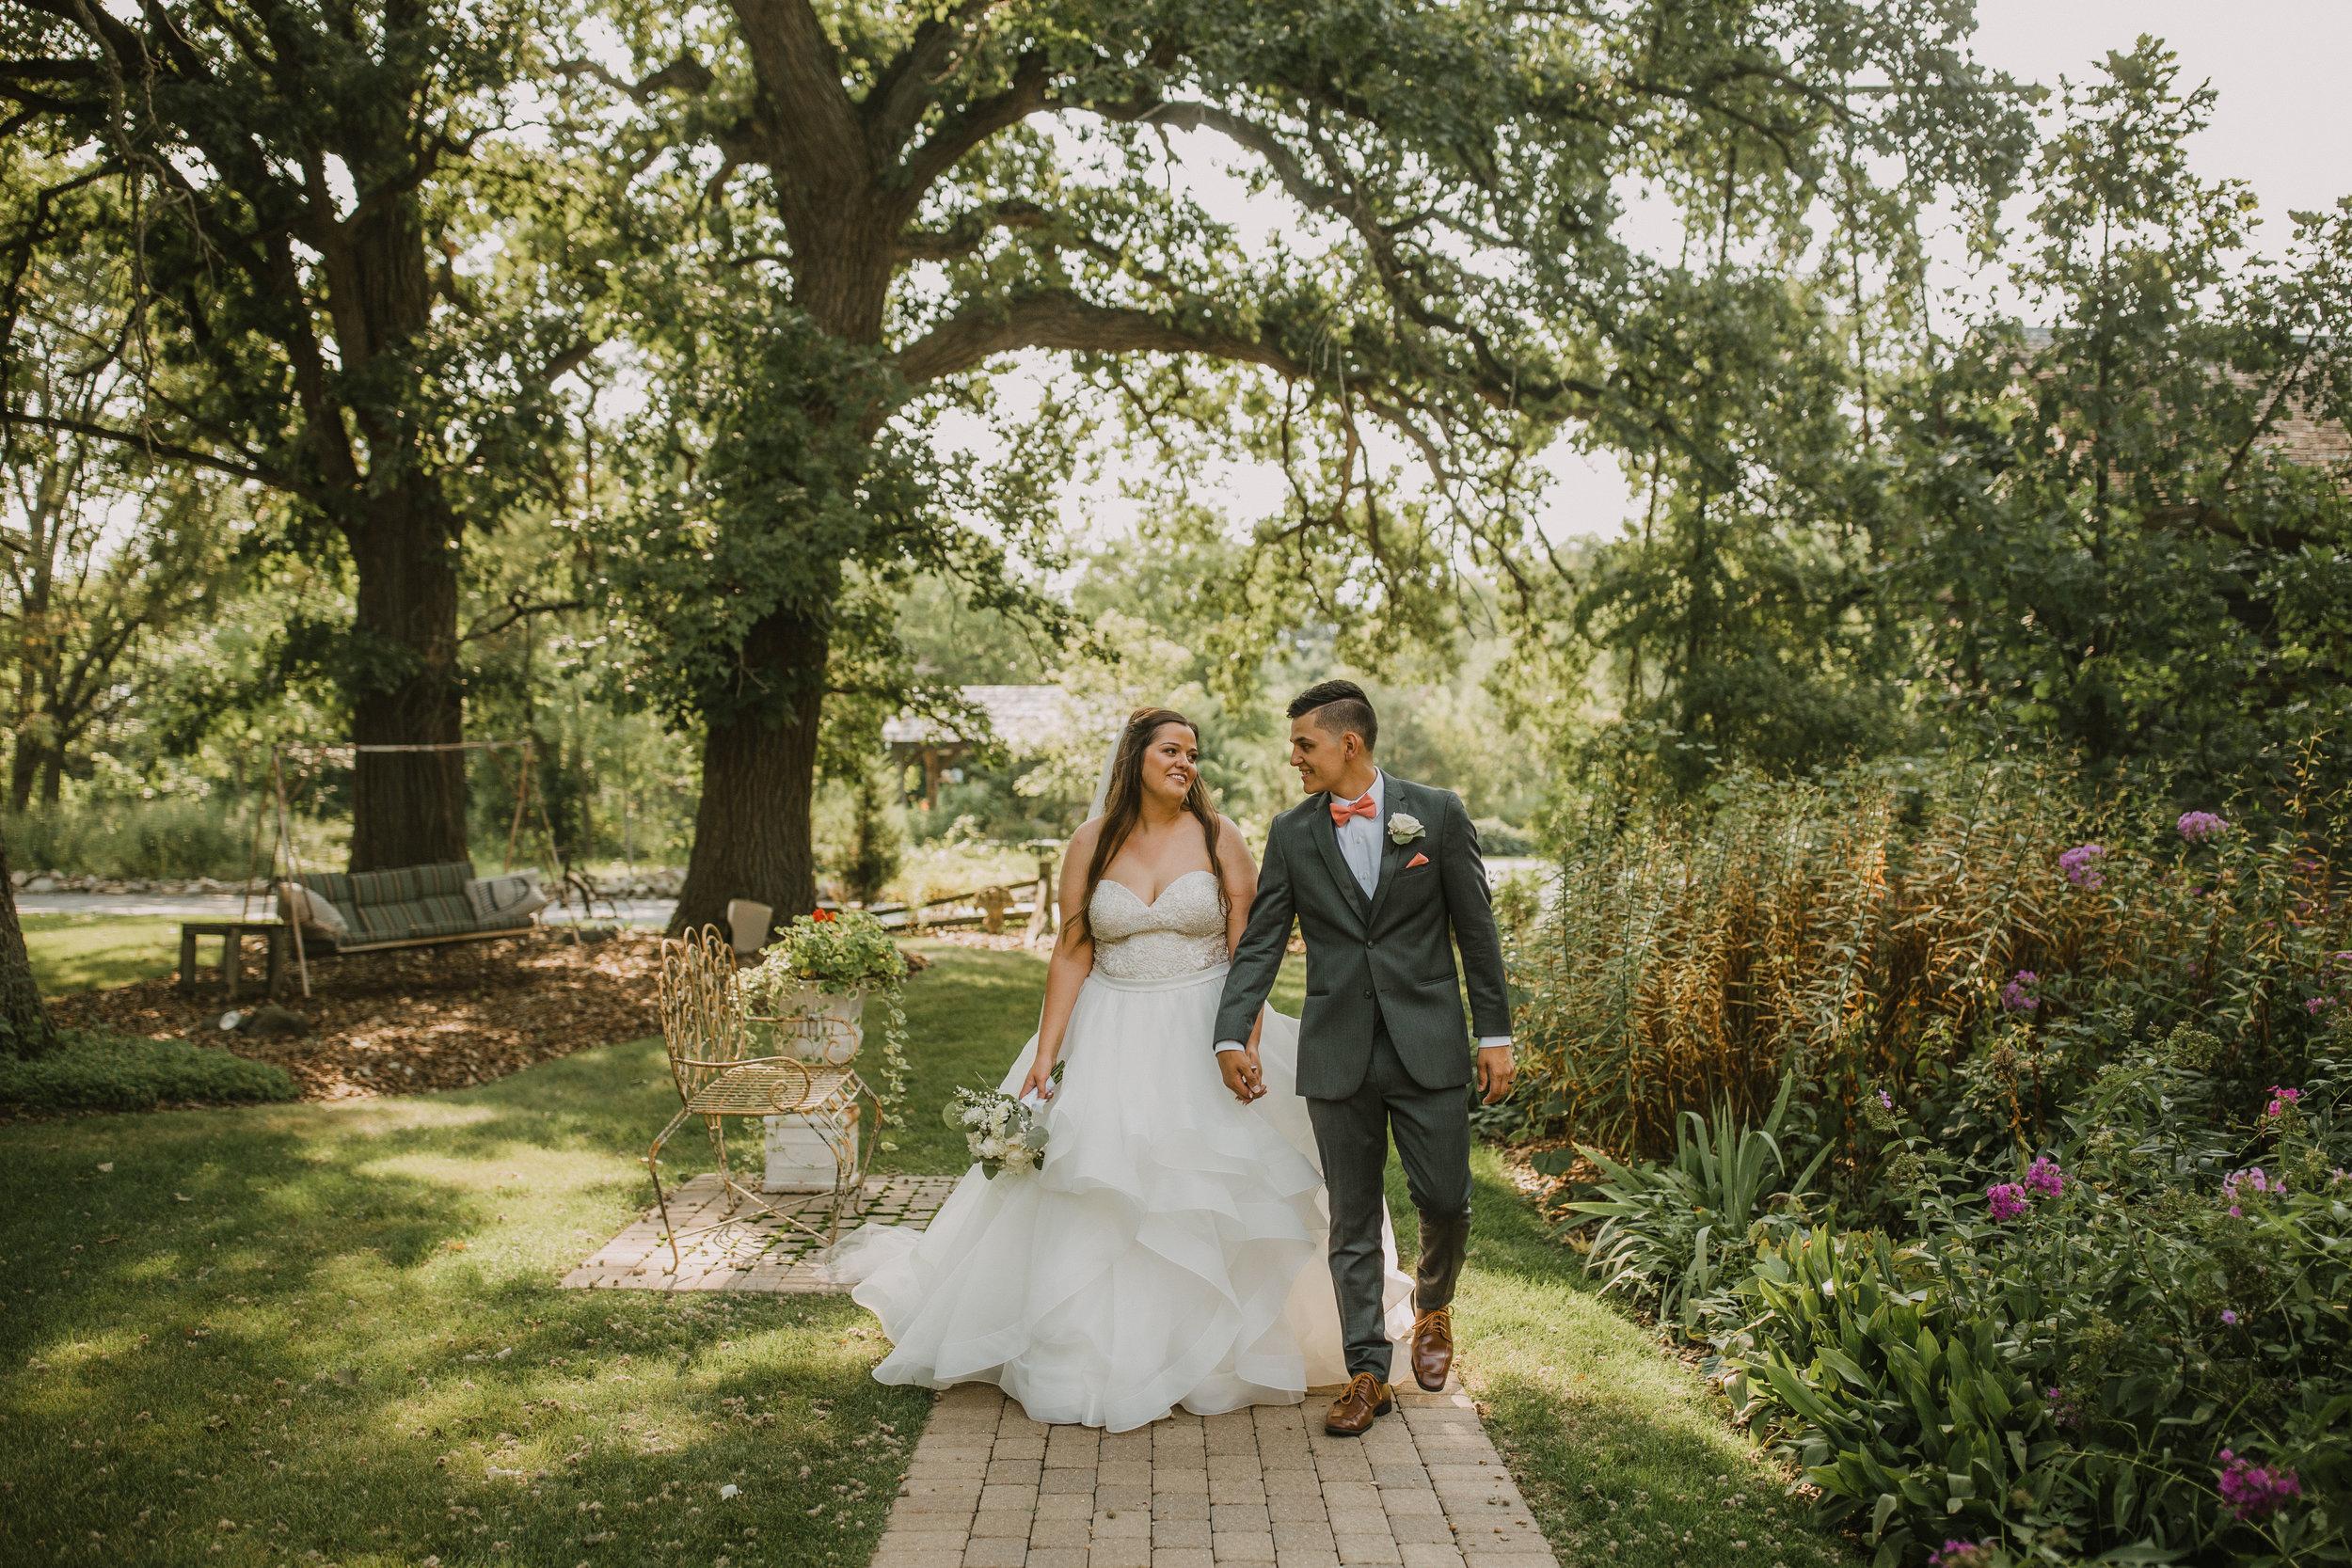 A&R-Wisconsin Wedding Photographer Videographer-433.jpg